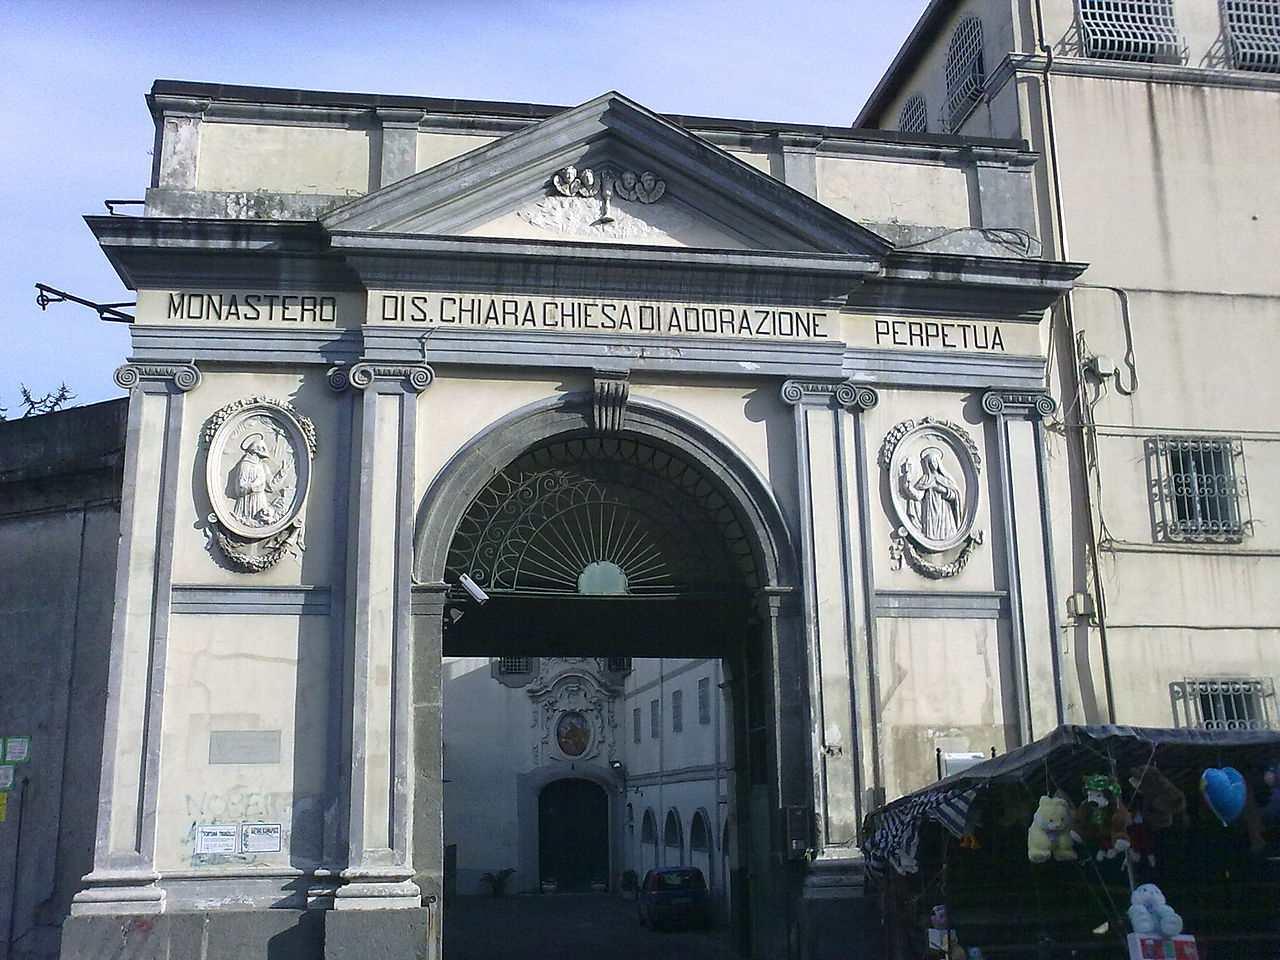 The Monastery of Santa Chiara